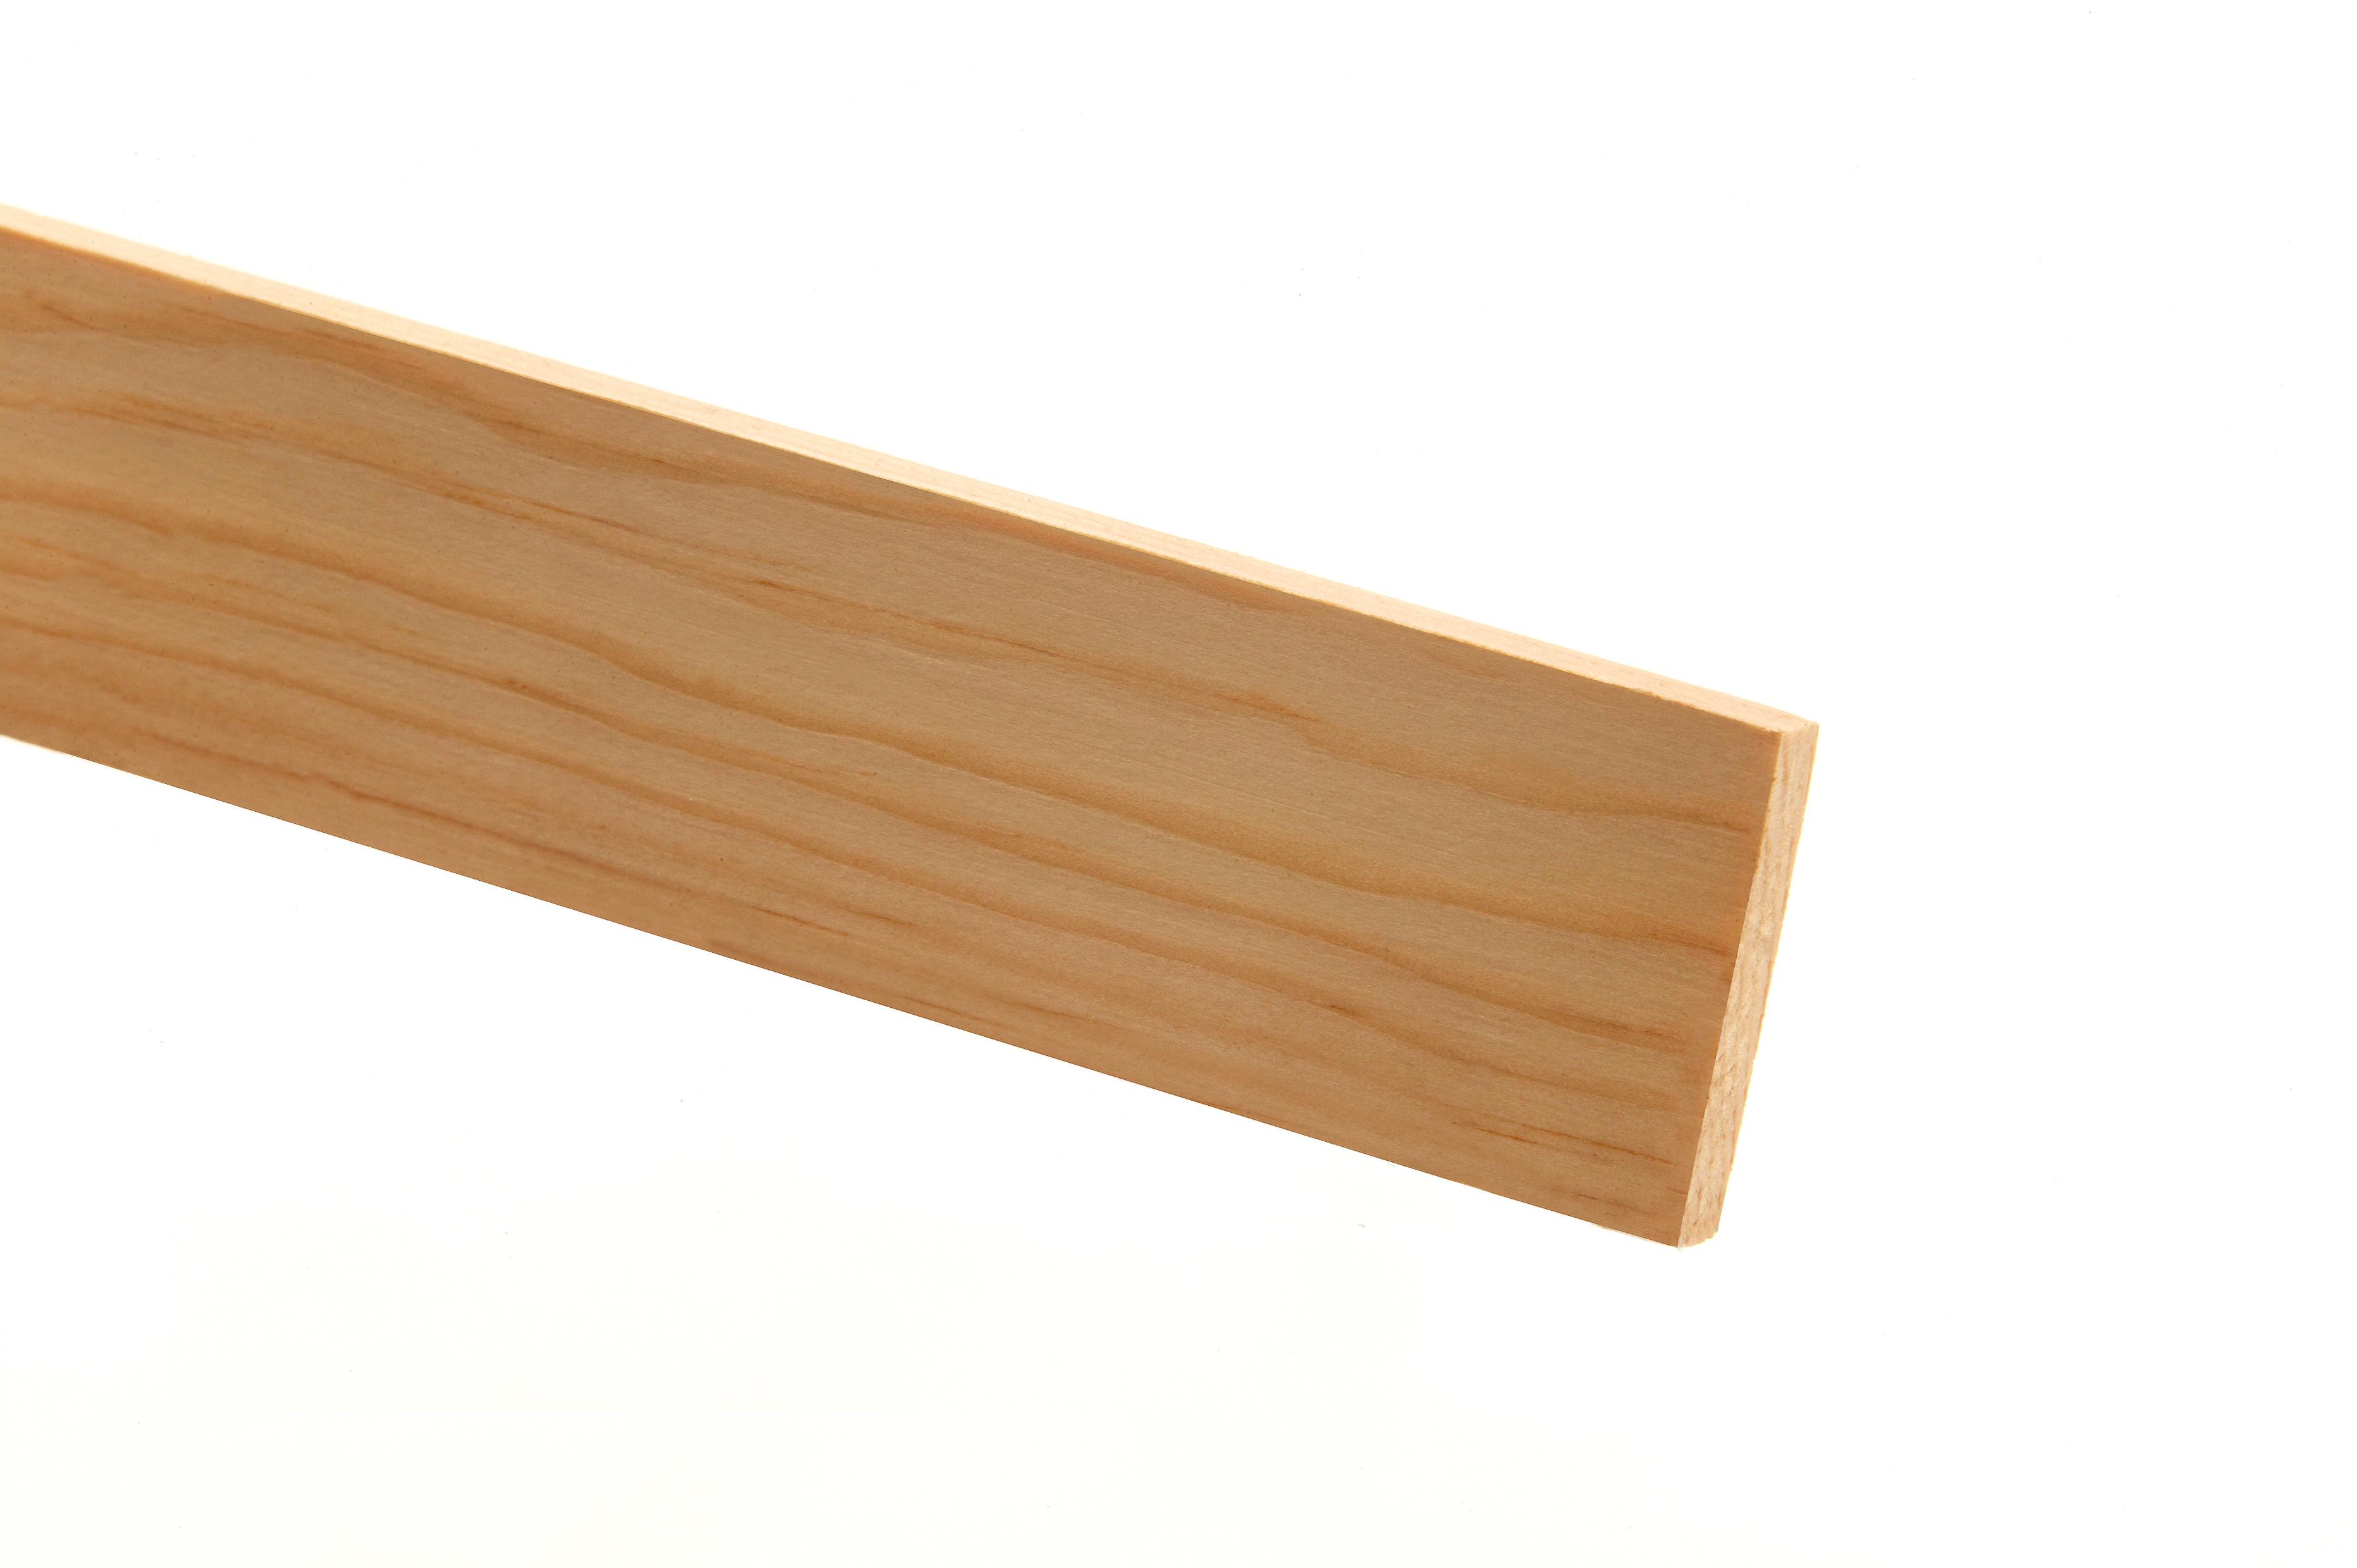 20 Pine PSE Stripwood 4 x 18 x 2400mm